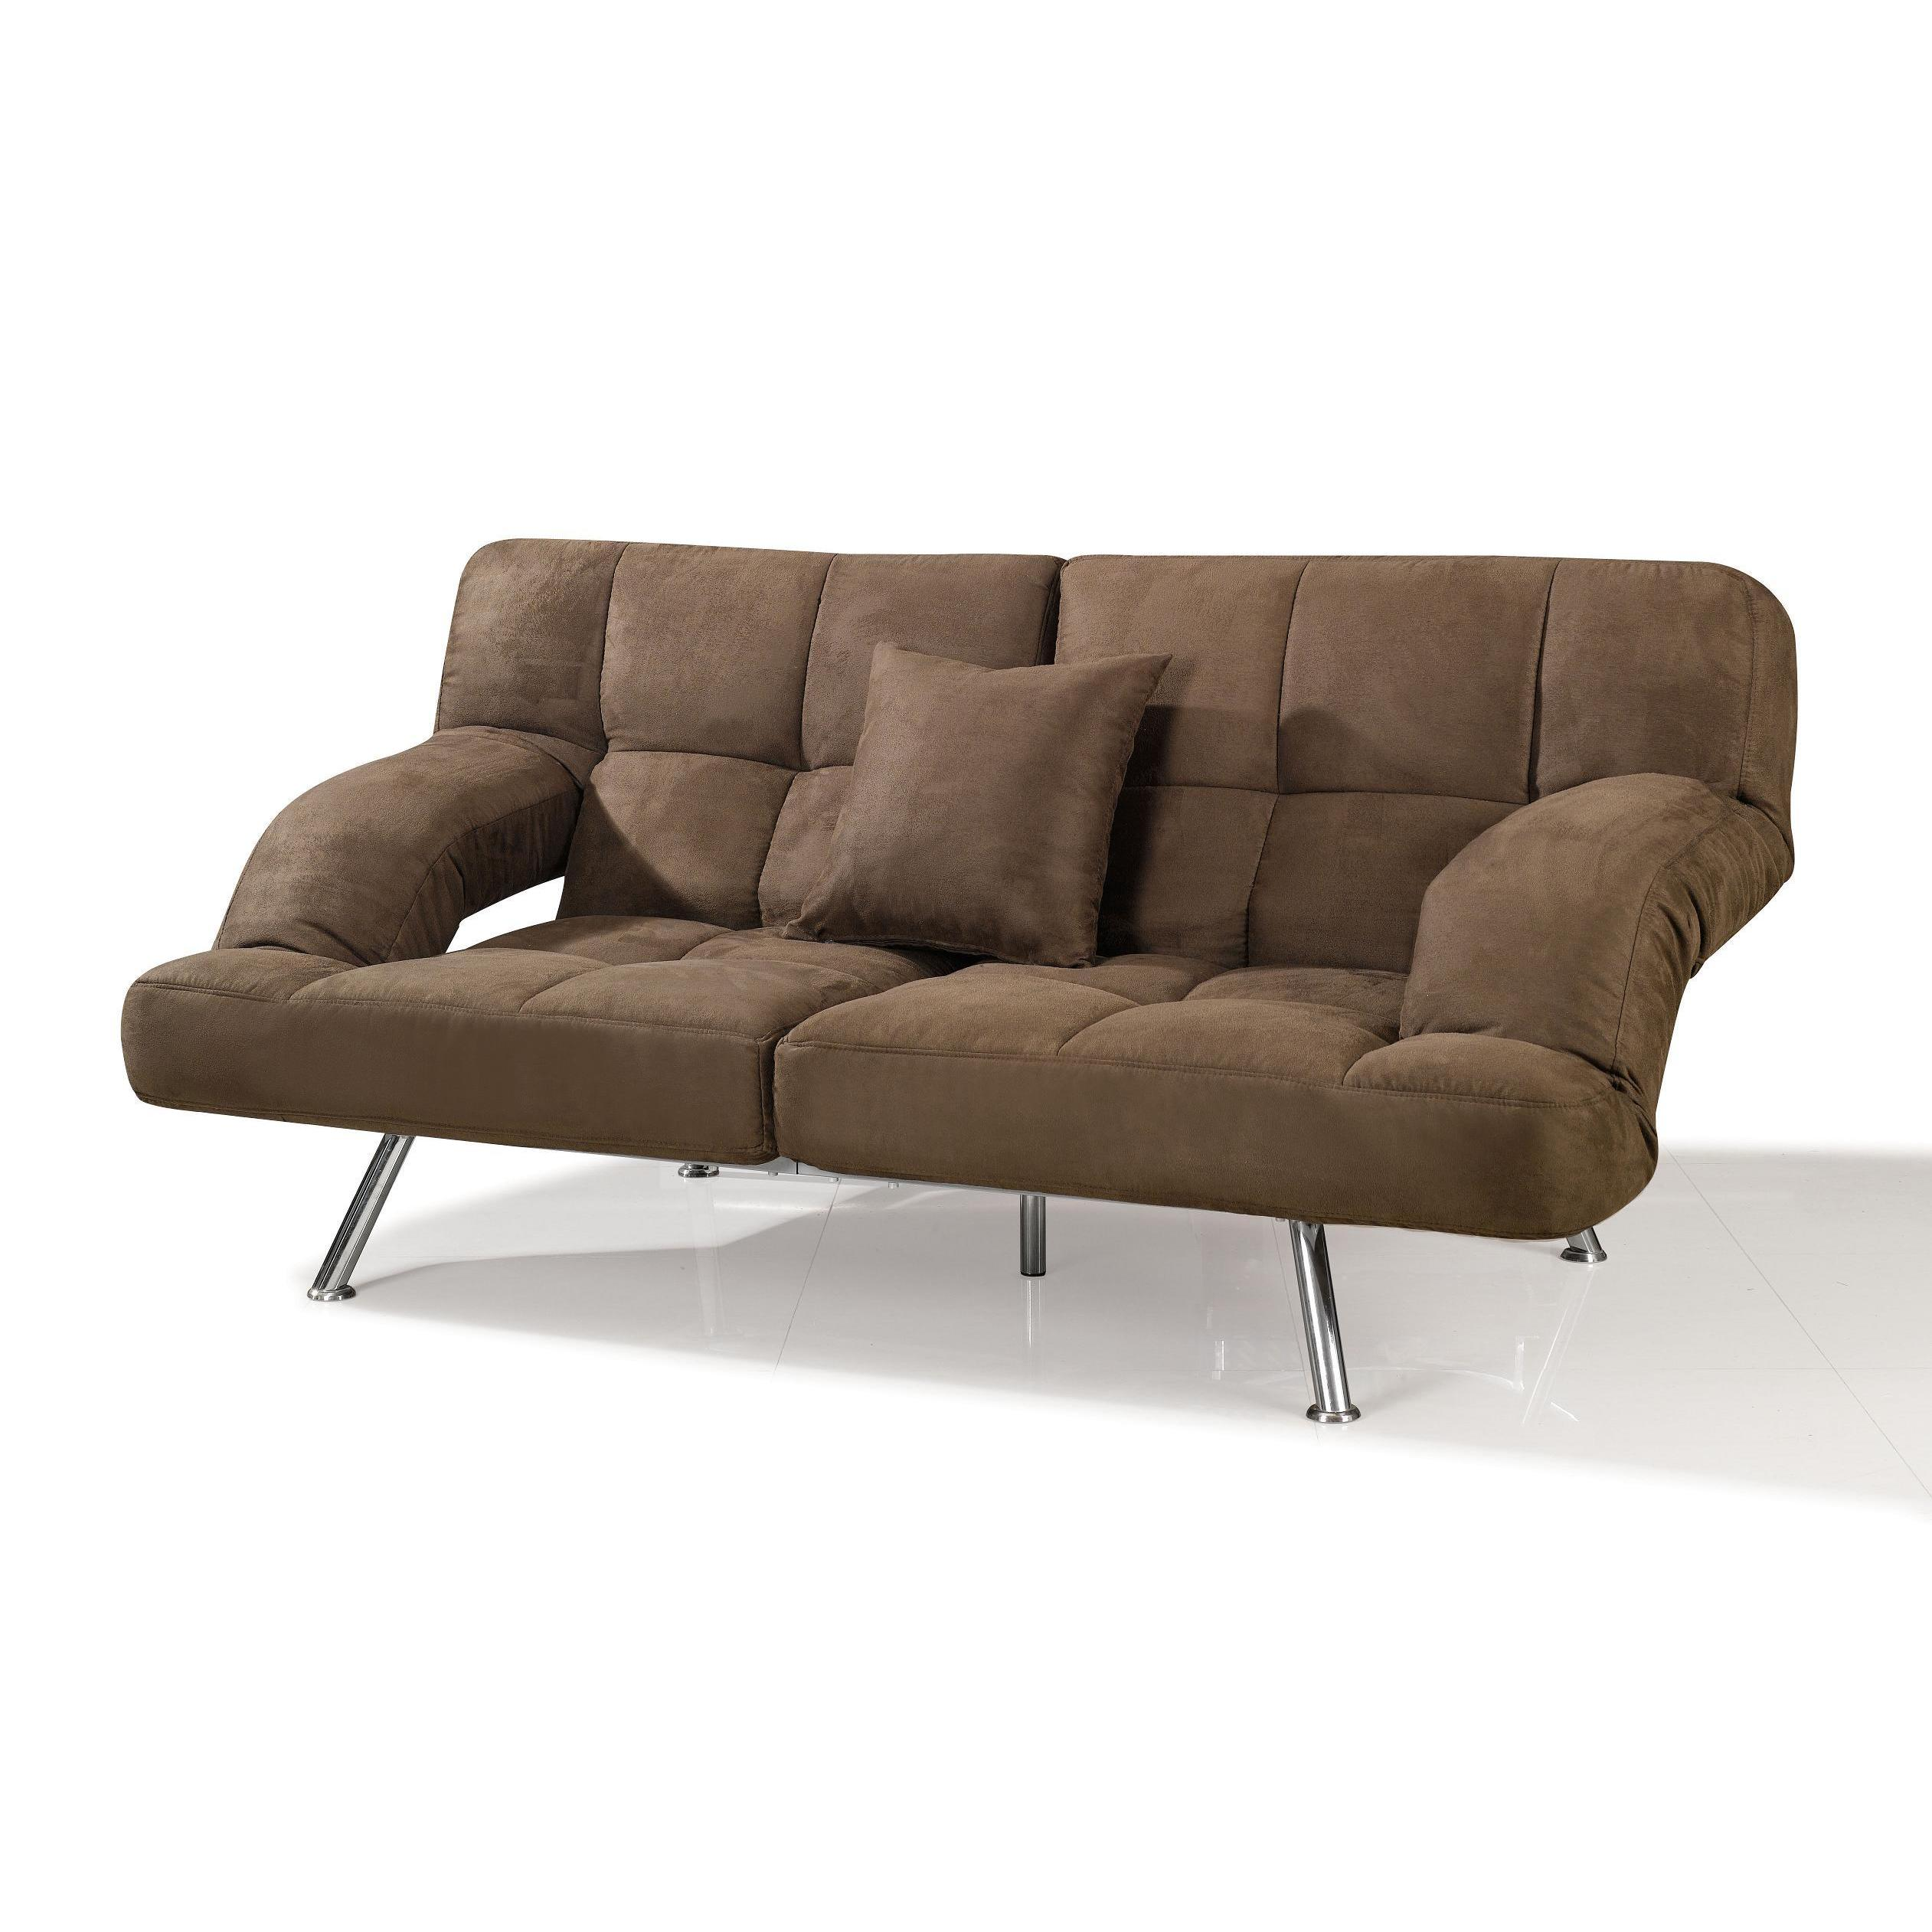 Shop Dark Brown Microfiber Sofa Bed - Free Shipping Today ...